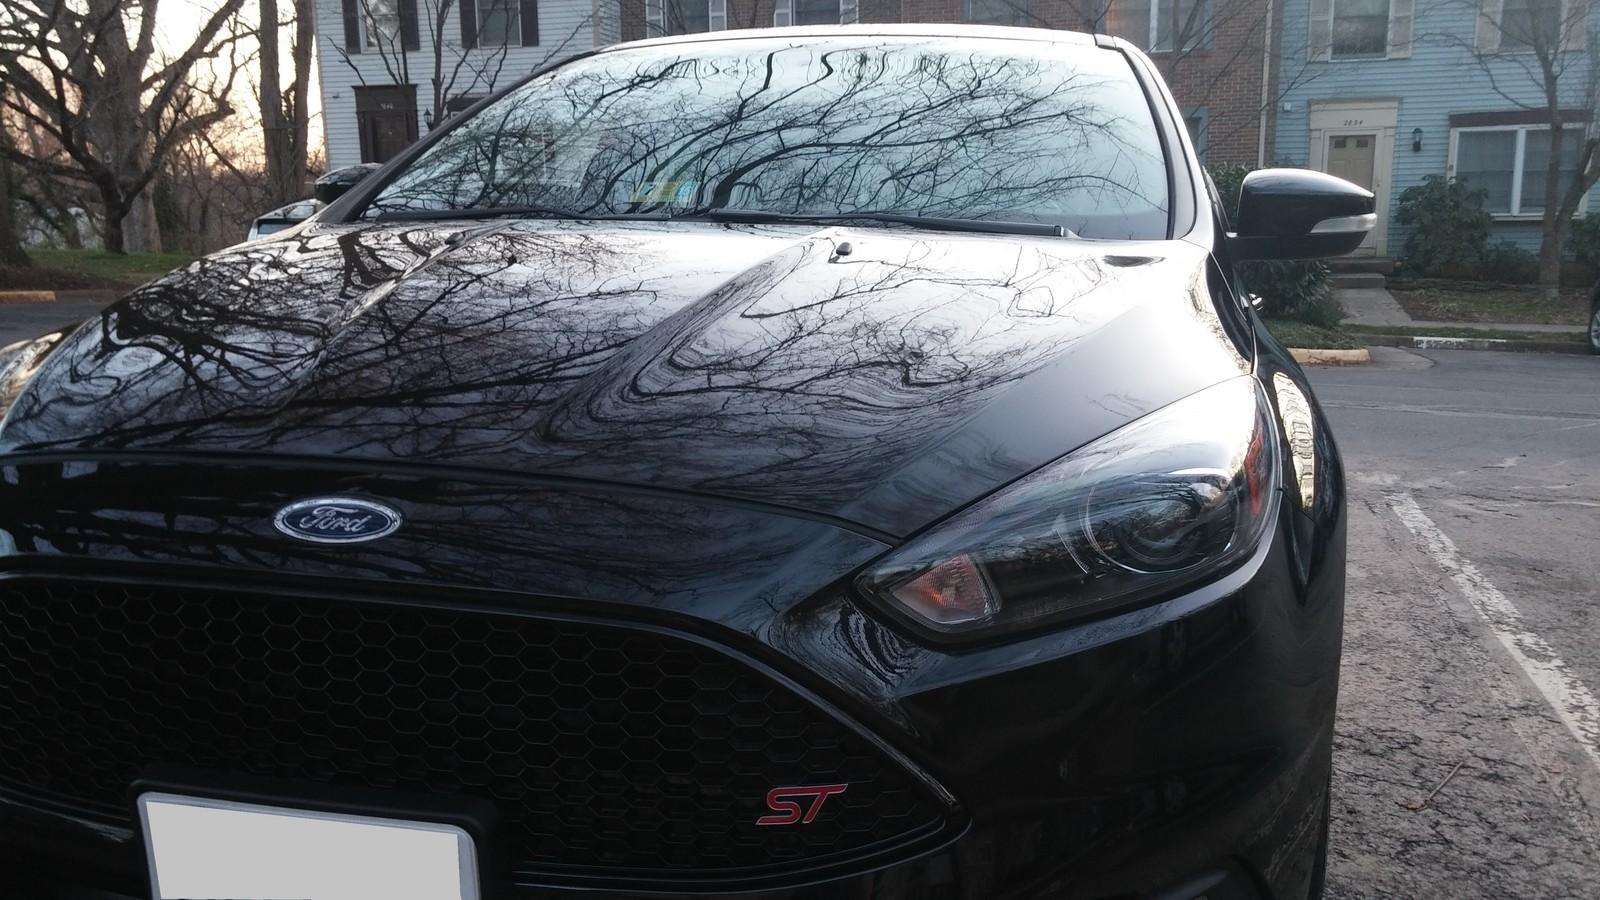 Focus St 0 60 >> 2015 Ford Focus St 1 4 Mile Trap Speeds 0 60 Dragtimes Com